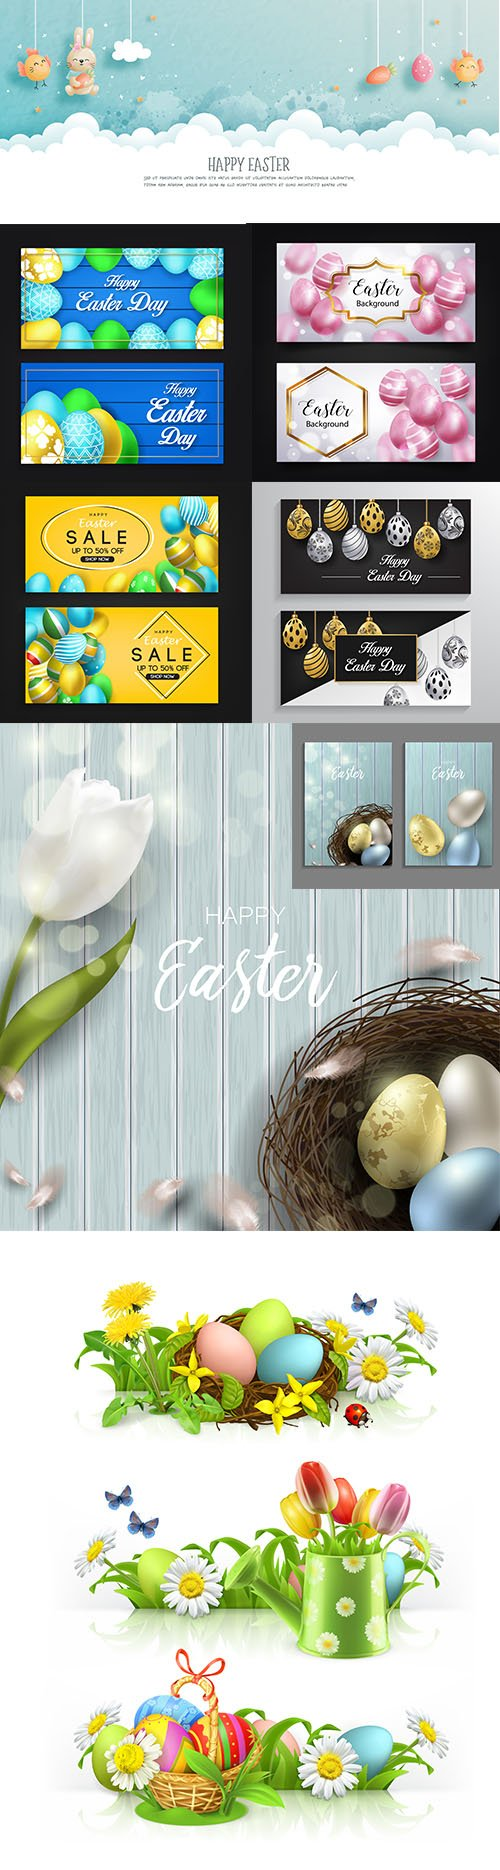 Happy Easter Day Premium Illustrations Set